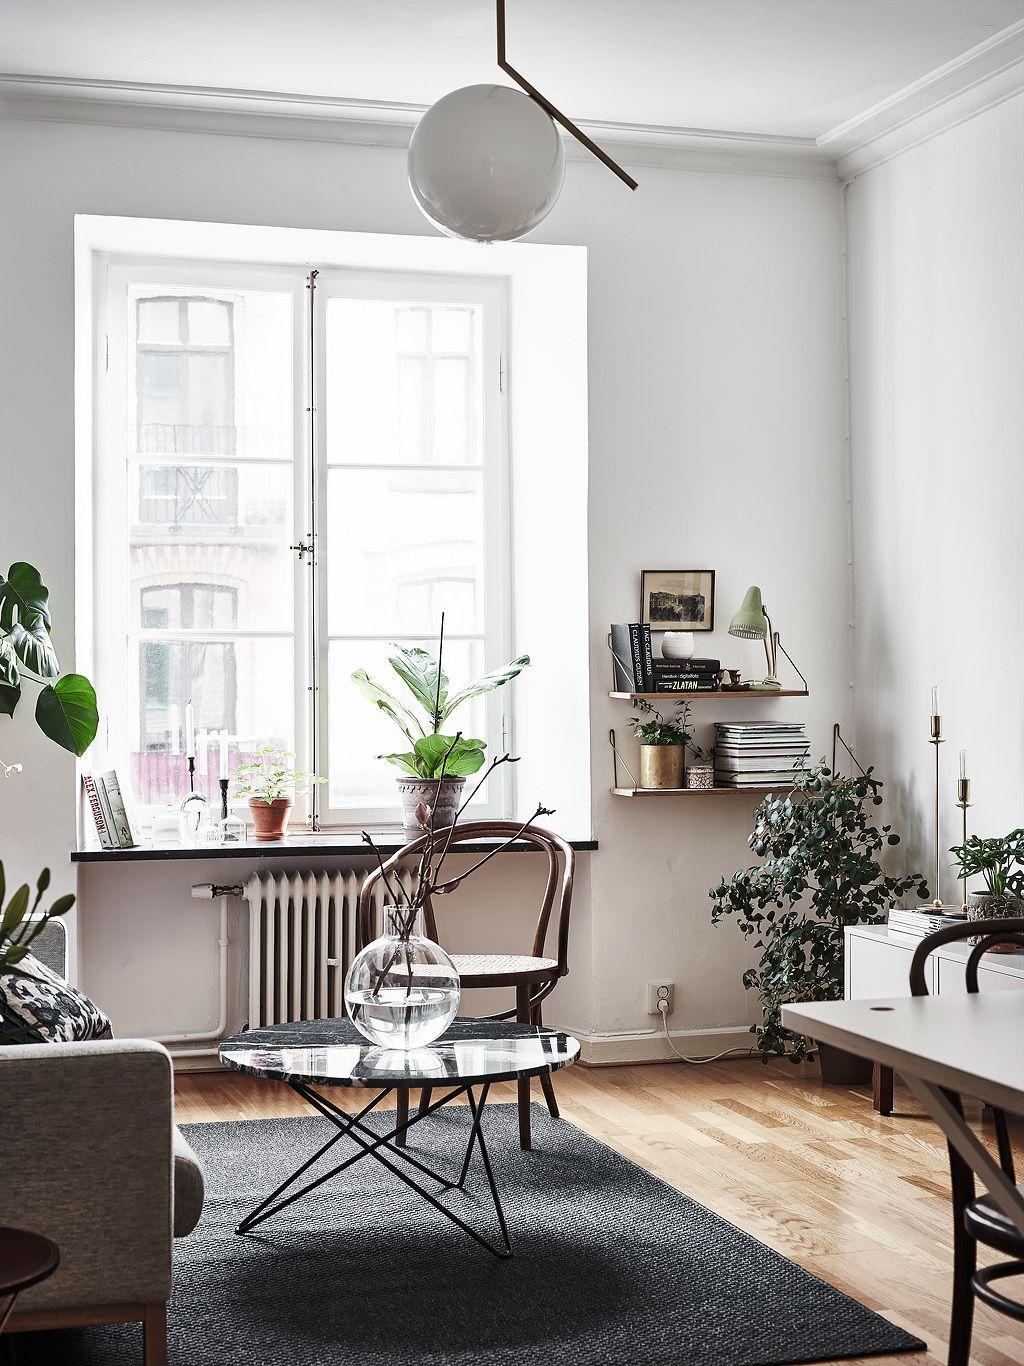 Furniture Decor Bostadsrtt Sveagatan 23 A